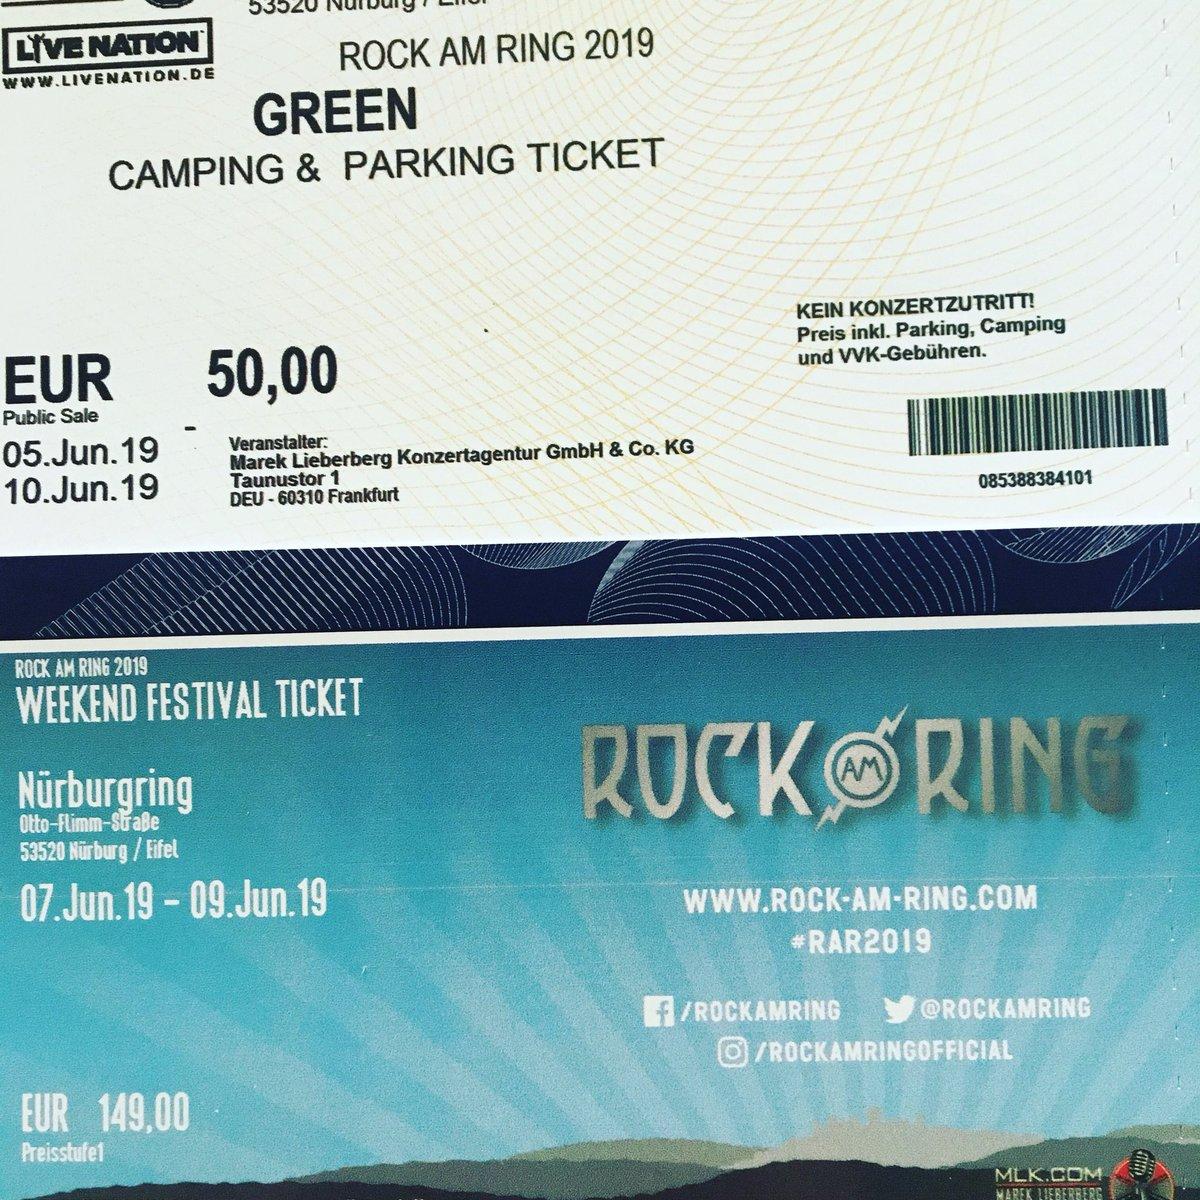 Rock Am Ring Karte.Screamingblatz On Twitter Freu Mich Jetzt Schon Auf Rock Am Ring